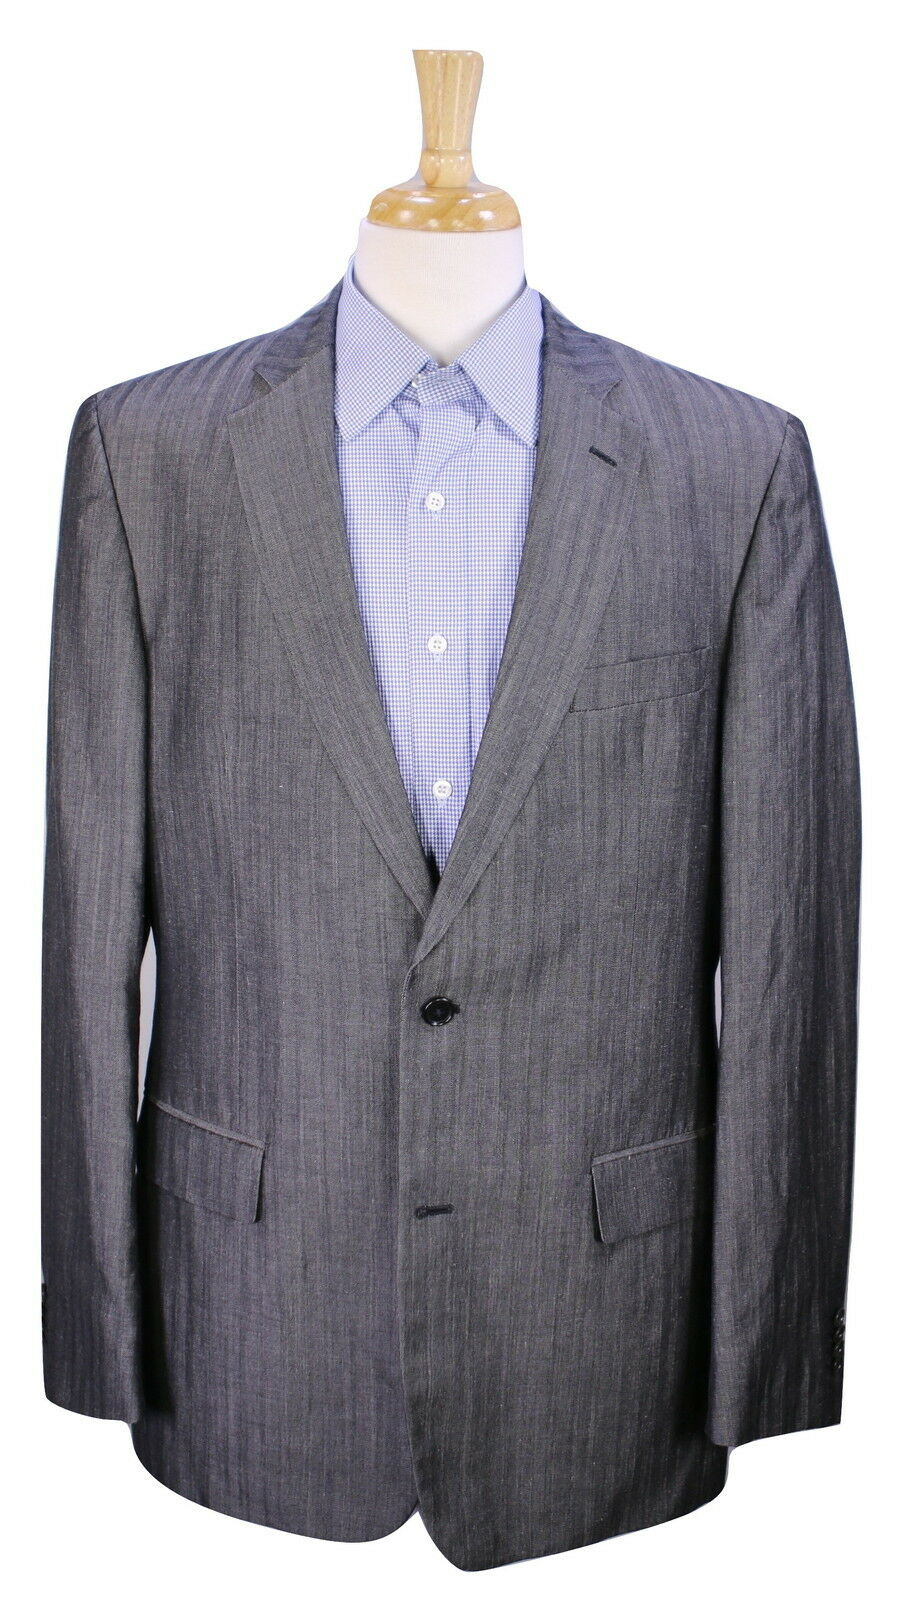 JOHN VARVATOS  grau Tonestripes Wool-Linen 2-Btn Sportcoat Blazer 42L